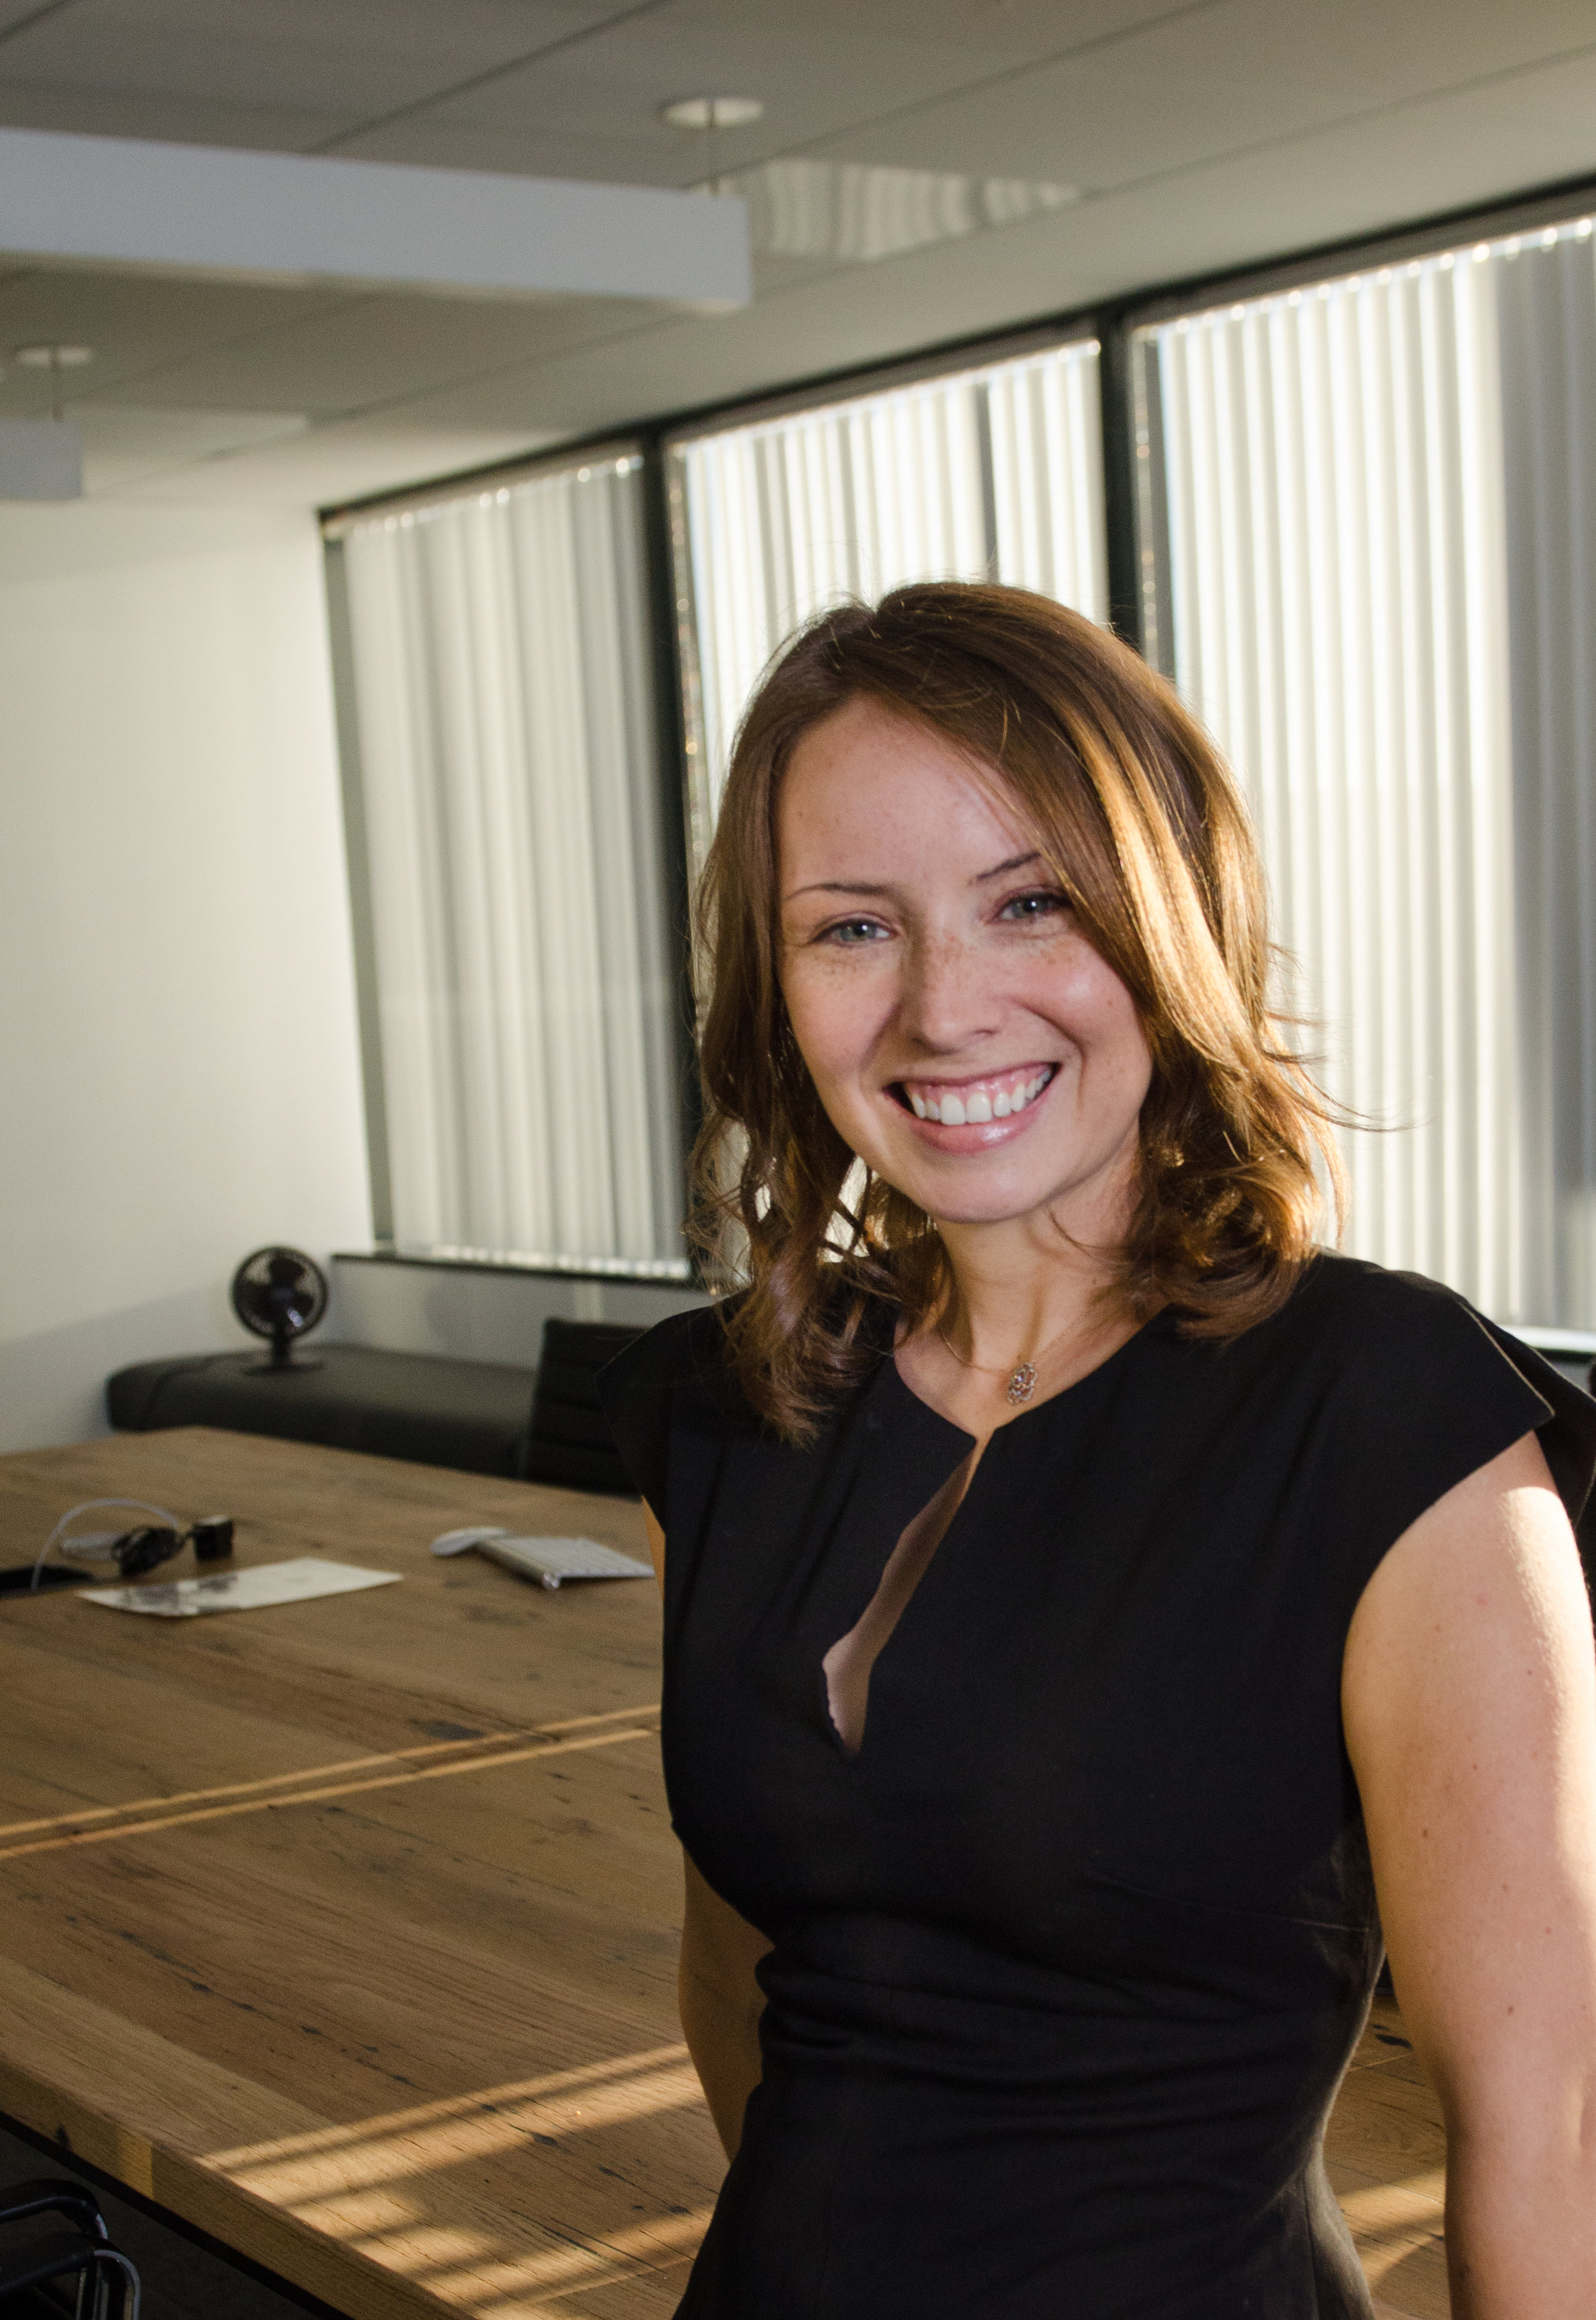 Chelsea Szabo - Career & Personal Growth Coach & Speaker, Verbal Courage